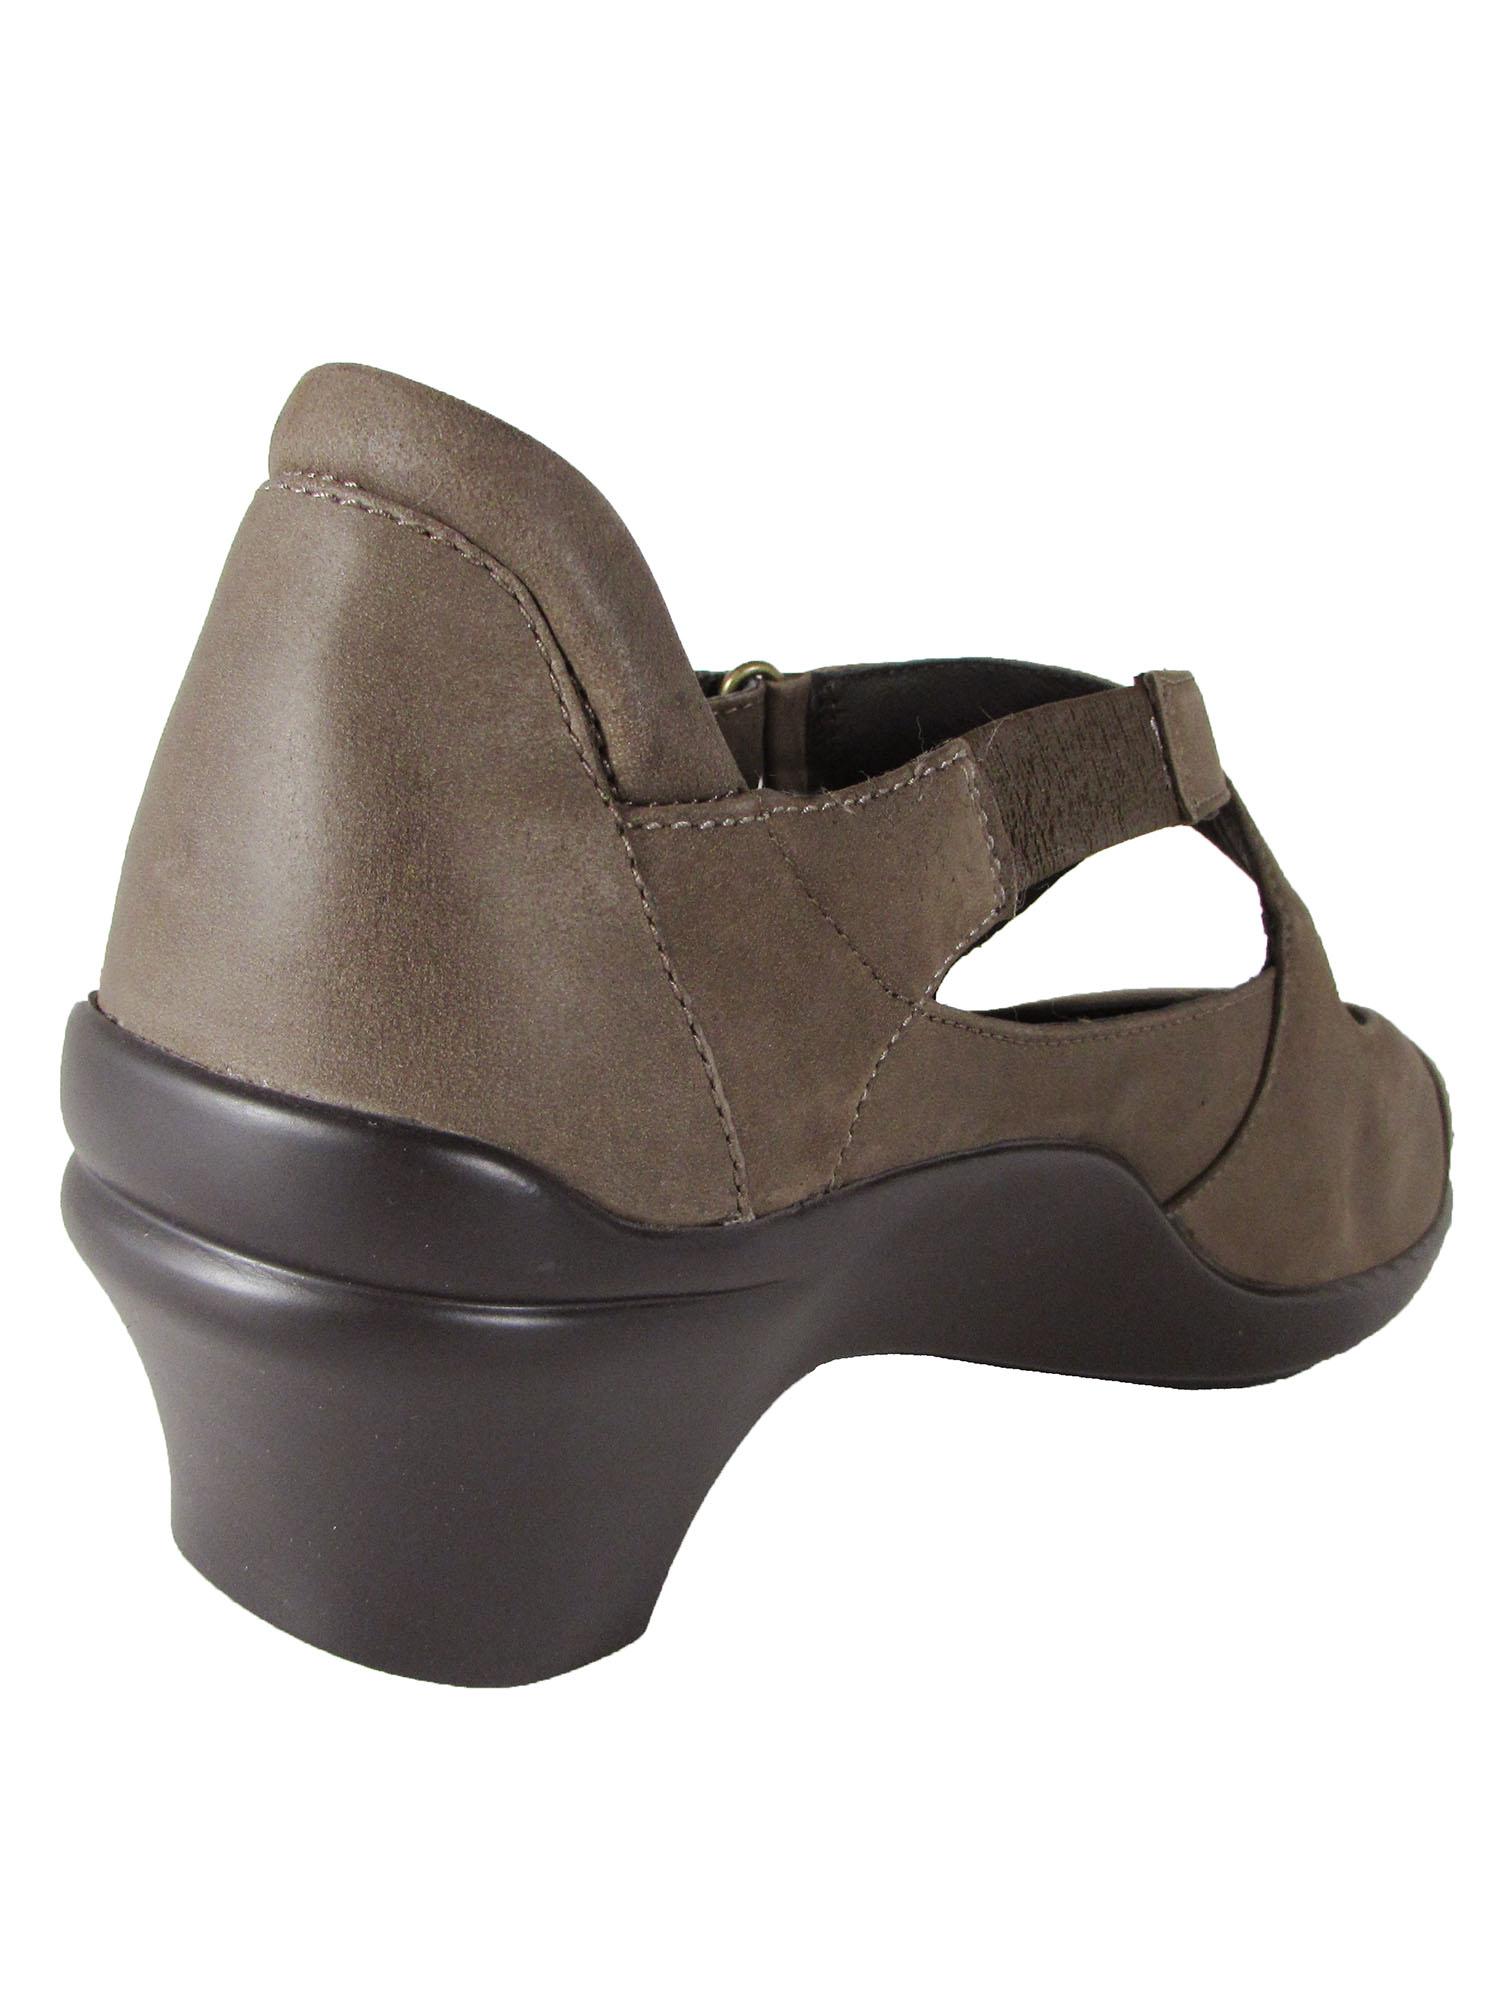 Aravon-Womens-Mona-Slip-On-Pump-Shoes thumbnail 7